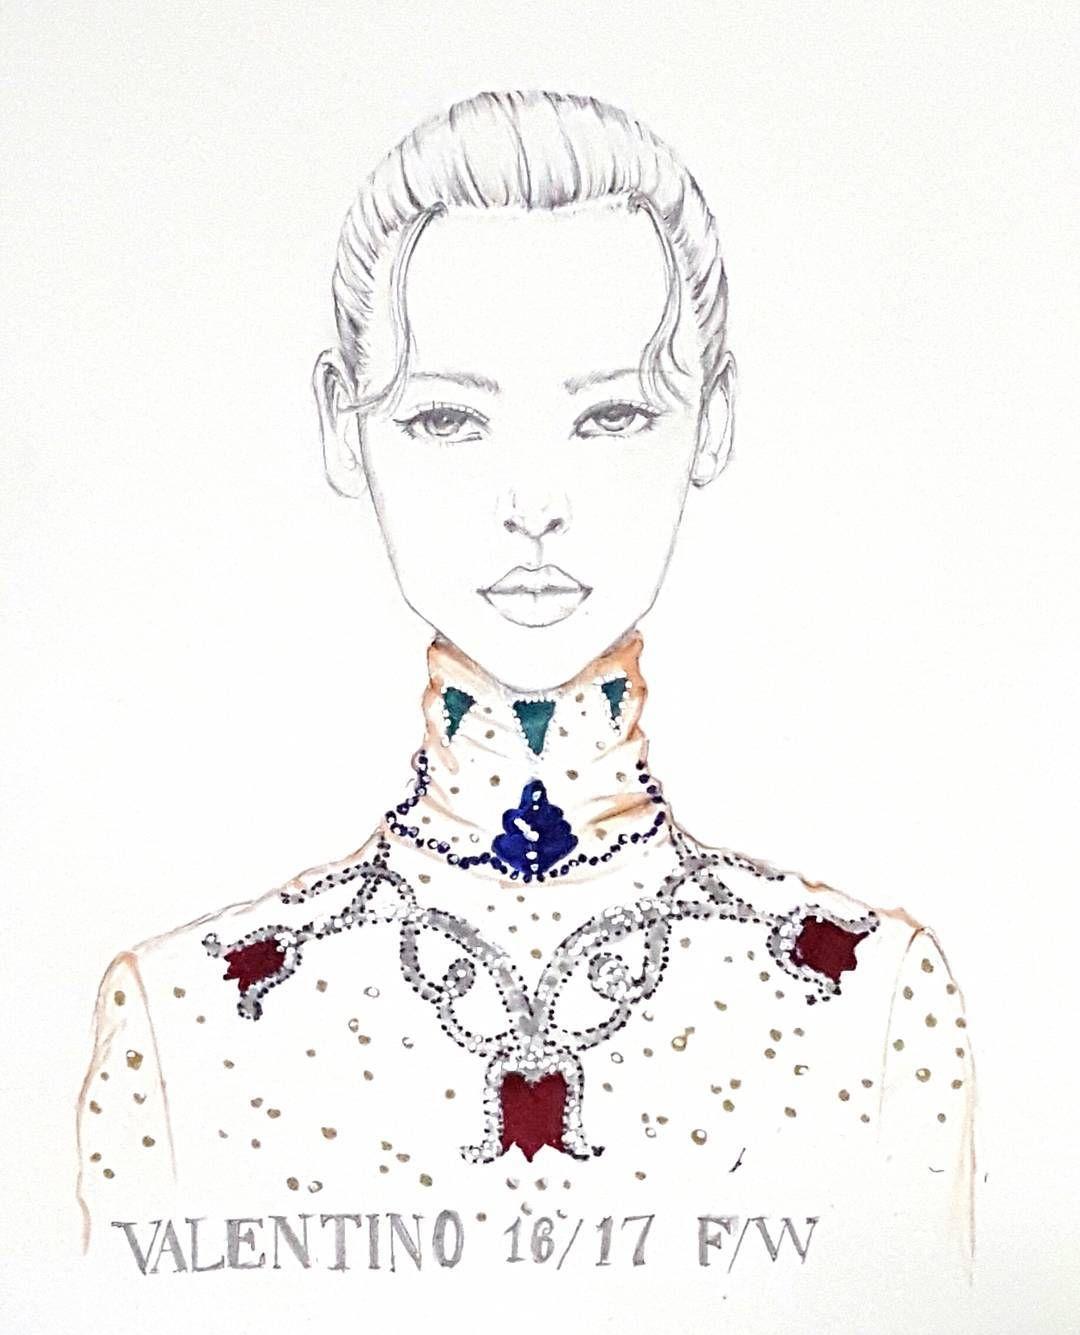 It's weekend!! My new drawing @maisonvalentino 16/17 fw  #fashionillustration #fashionillustrator #fashionshow #pfw16 #valentino #portrait #illustration #mywork #illustrator #fashionsketch #drawing  #girl #moda #model #artist  #vogue #voguemagazine  #패션일러스트 #패션일러스트레이션 #패션일러스트레이터 #패션스케치 #패션쇼 #컬렉션 #발렌티노 #패션디자인